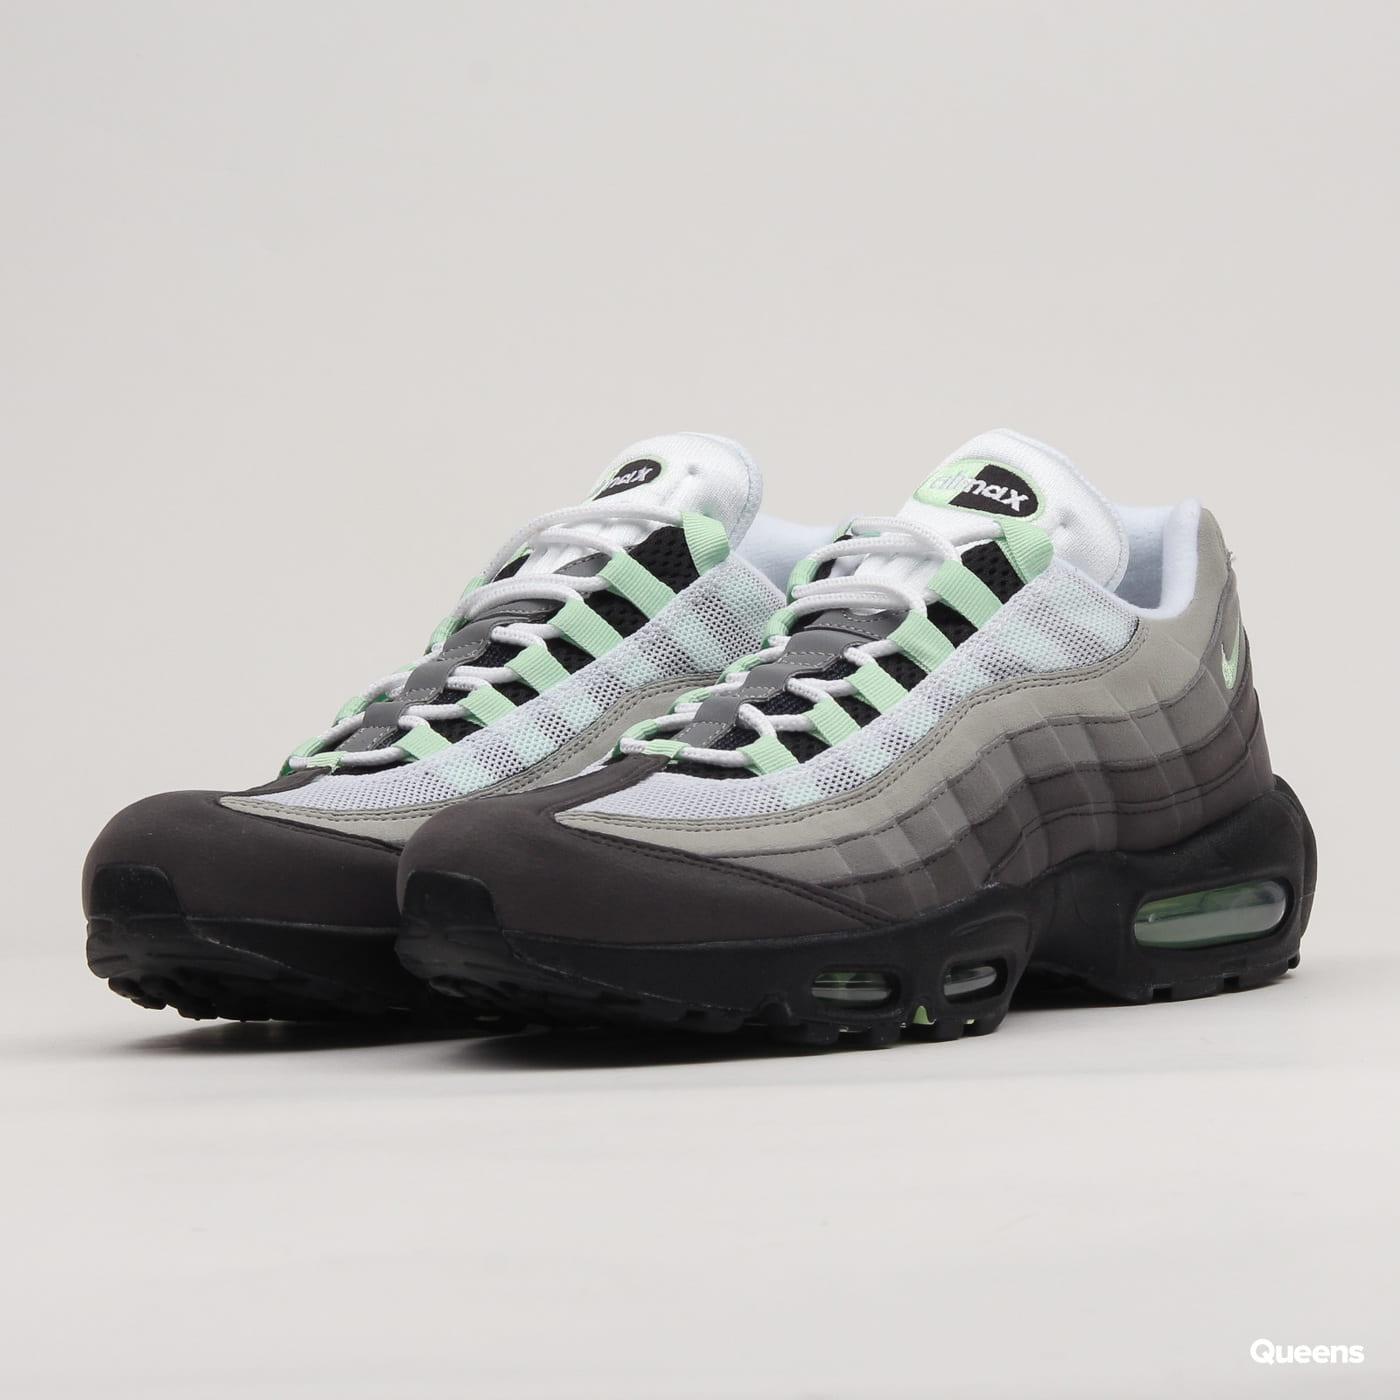 vente chaude en ligne 2c62c d5a6b Nike Air Max '95 white / fresh mint - granite - dust